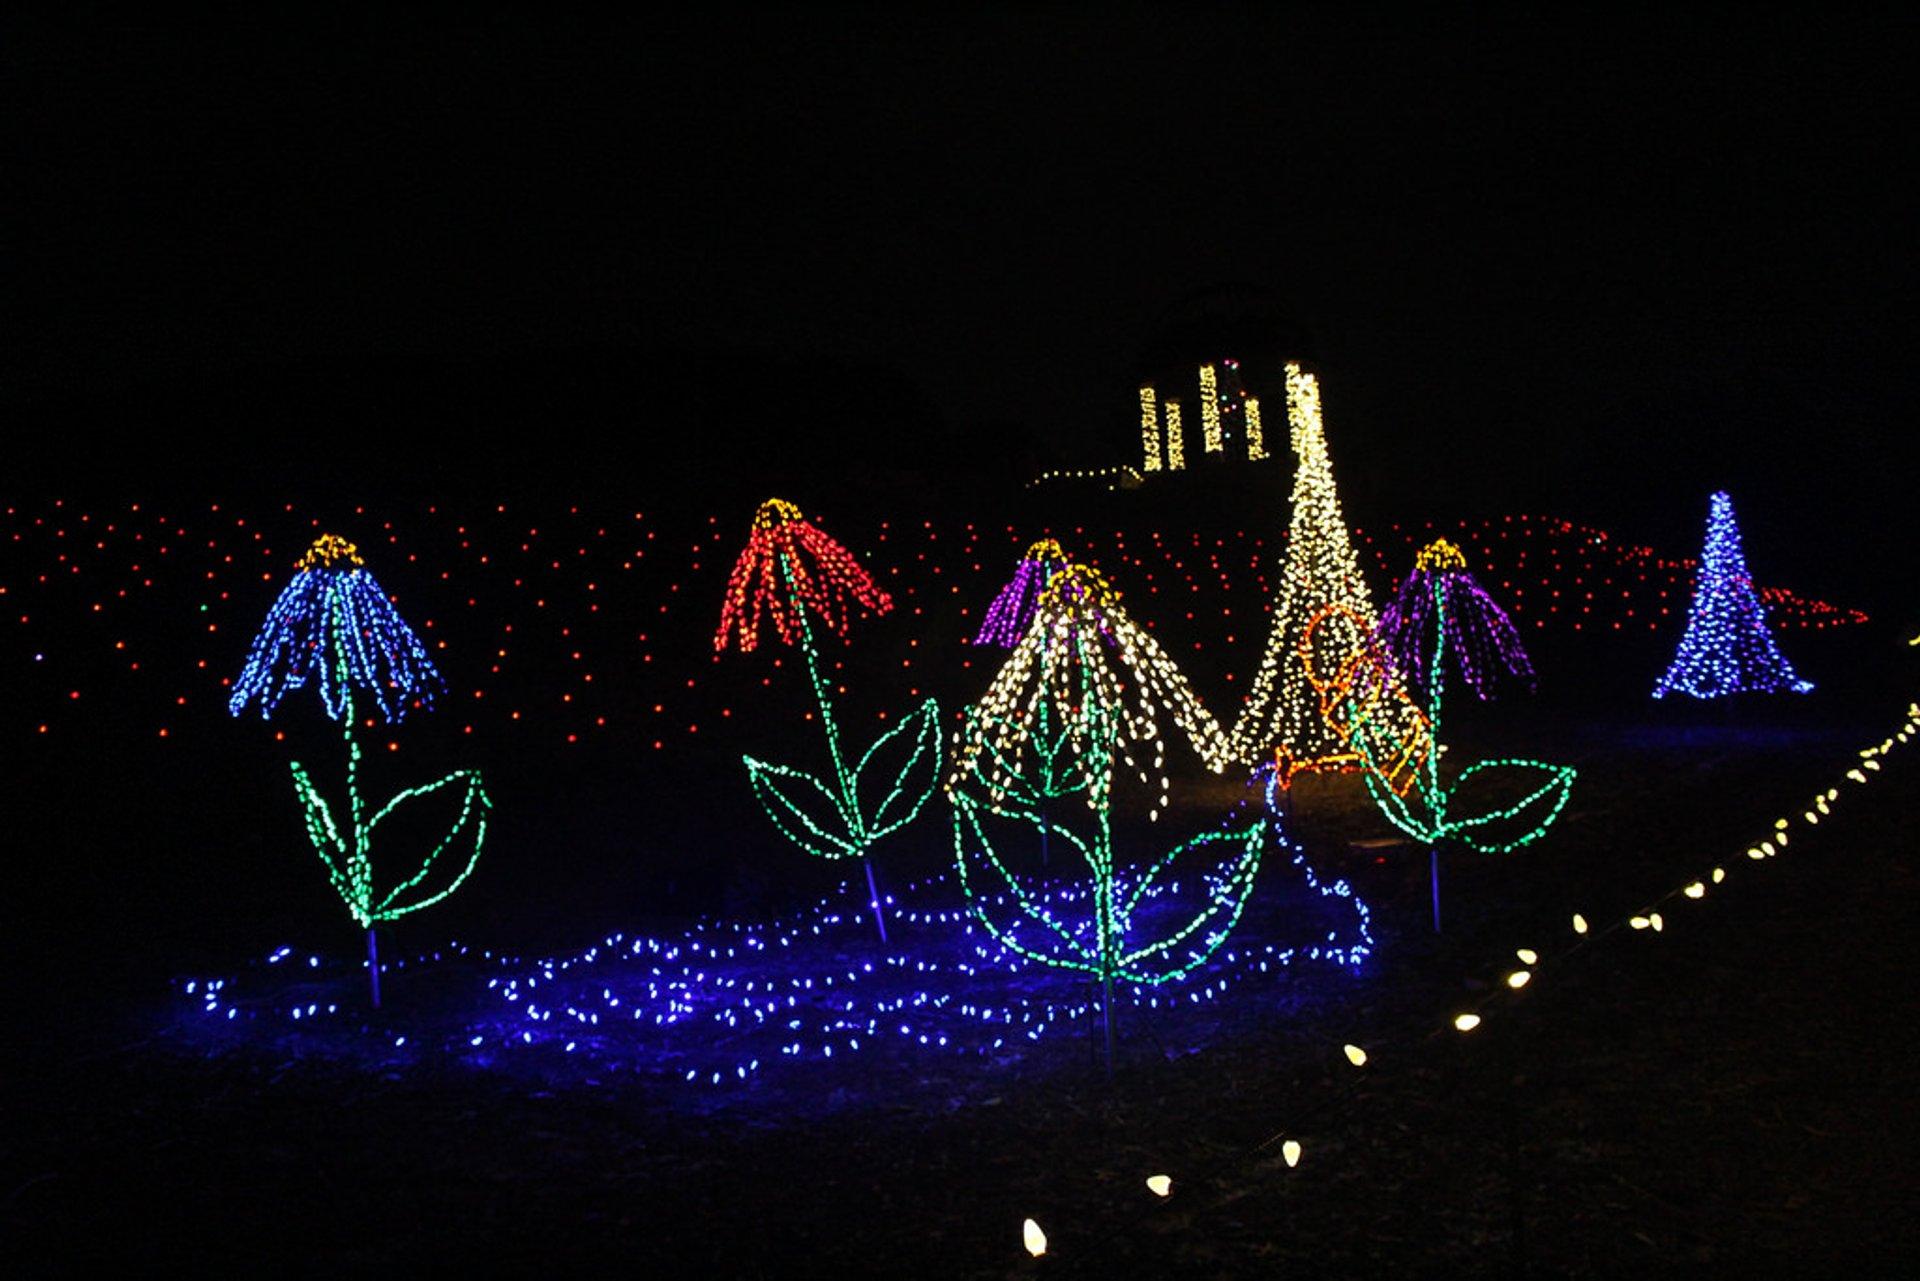 Garden of Lights at Green Bay Botanical Garden in Midwest - Best Season 2020